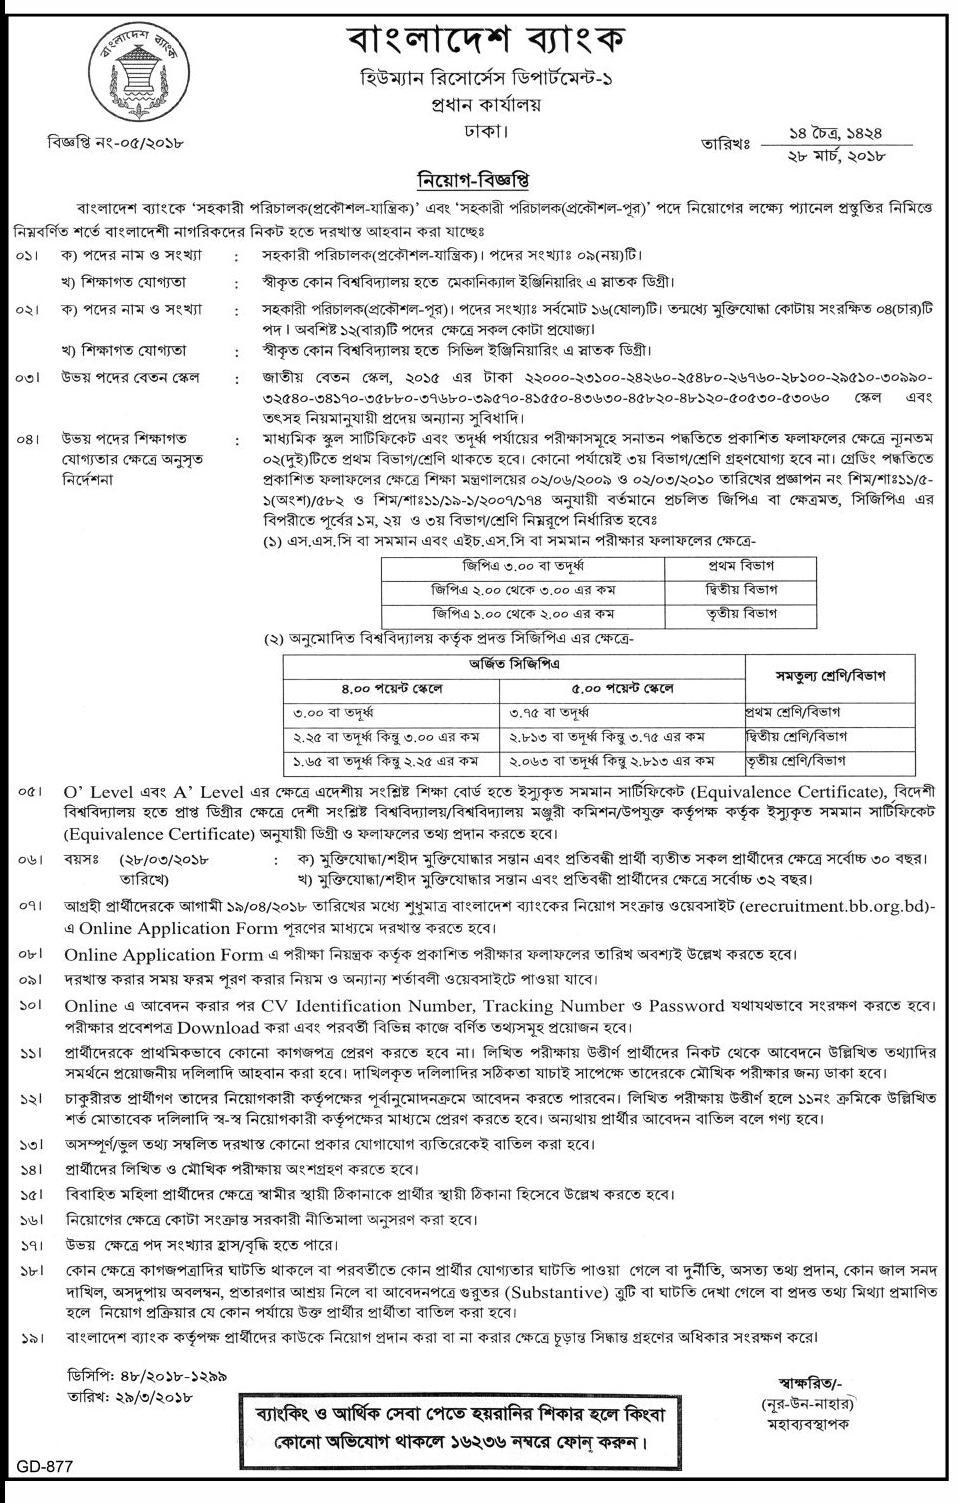 Bangladesh Bank (BB) Assistant Director (Engineer-Civil) and Assistant Director (Engineer-Mechanical) Job Circular 2018